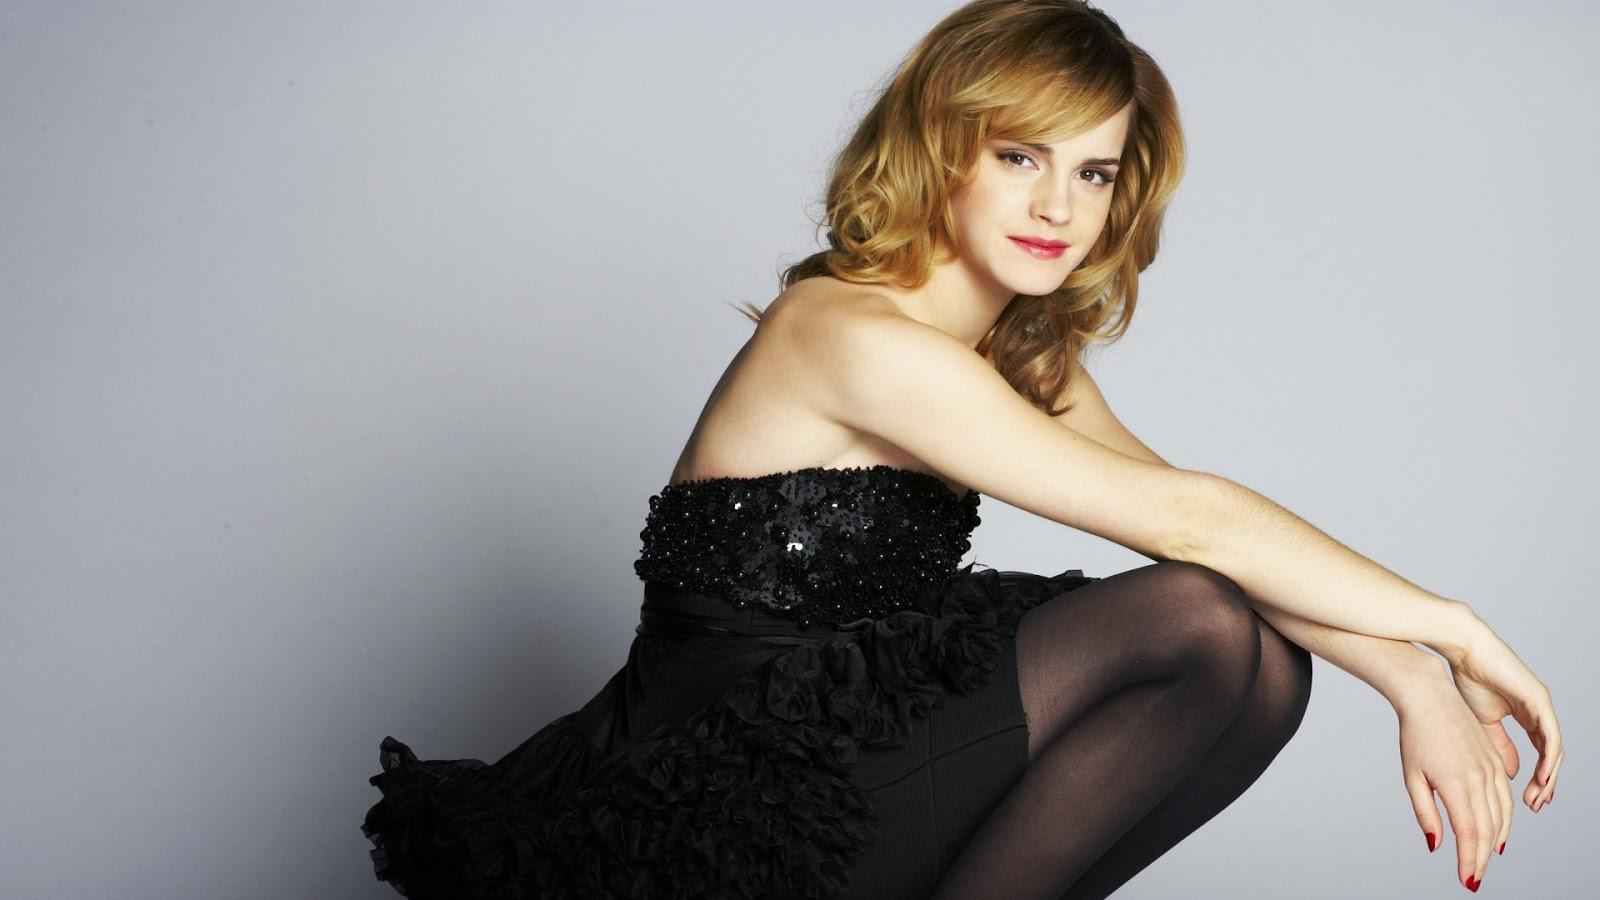 Sweet and Beautifull Emma Watson Photos